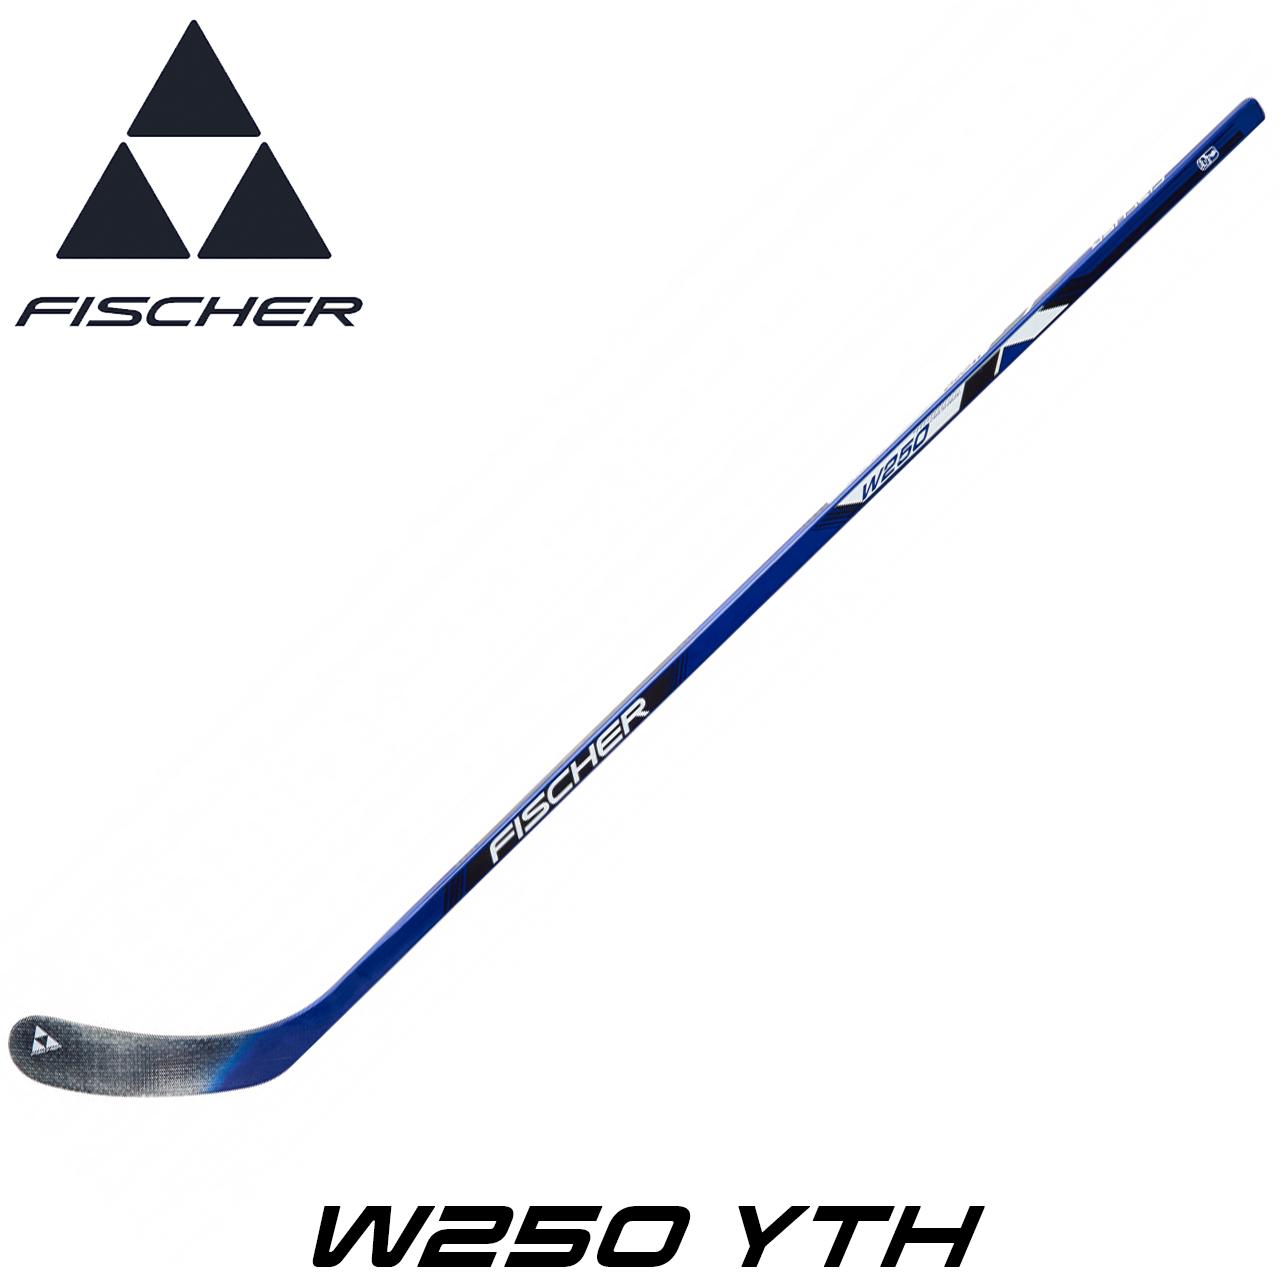 Хокейна ключка FISCHER W250 YTH 92